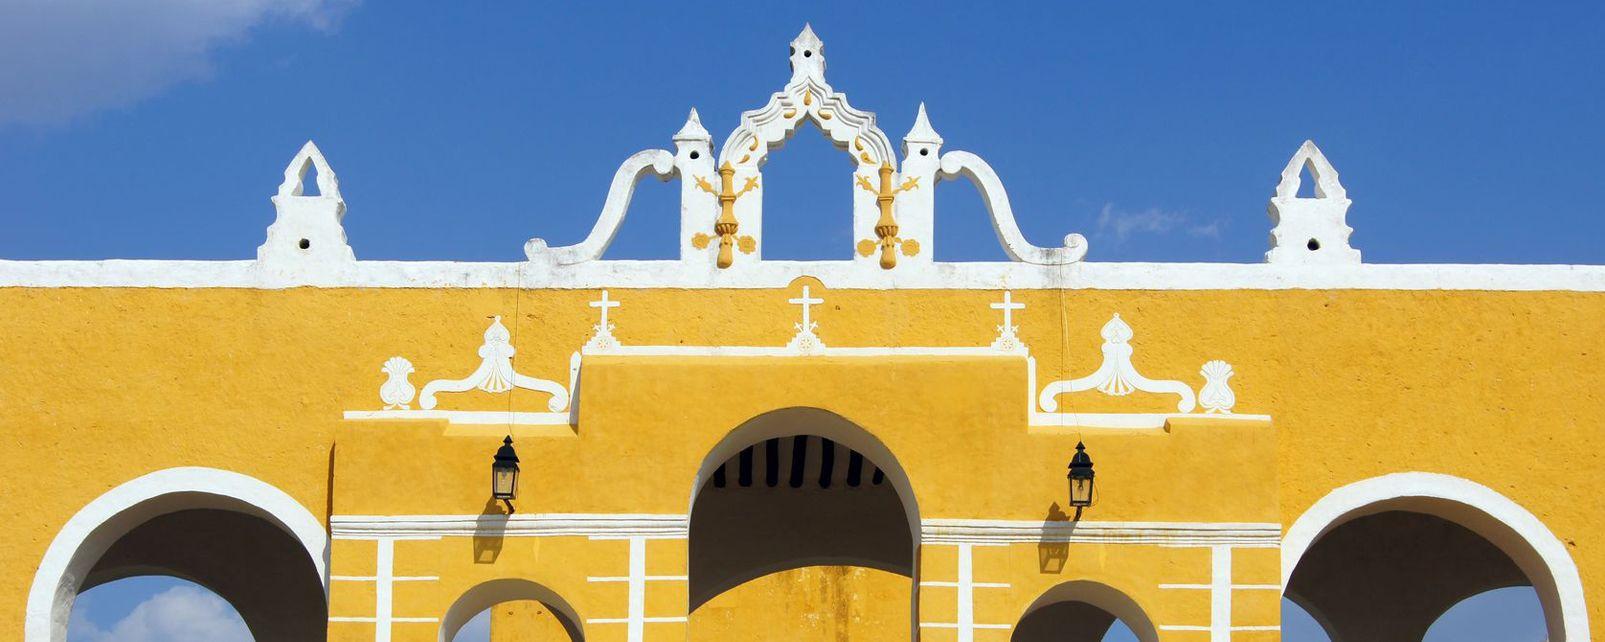 Les héritages historiques, Les arts et la culture, Mexique continental